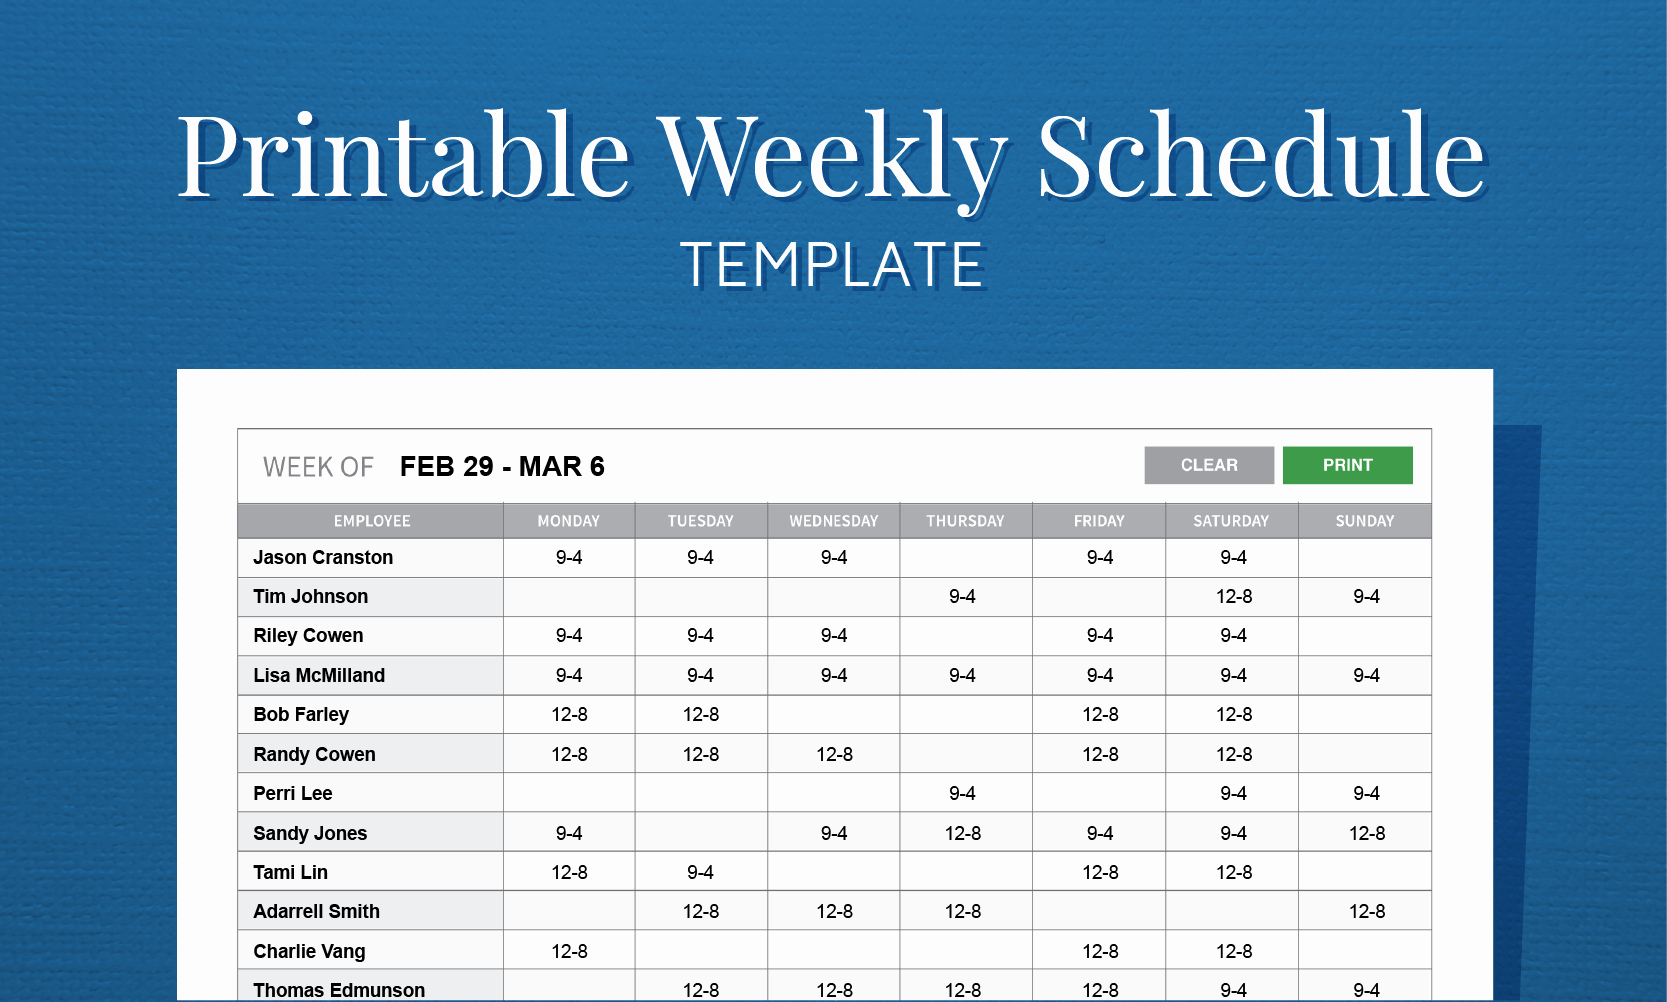 Work Week Schedule Template Inspirational Free Printable Weekly Work Schedule Template for Employee